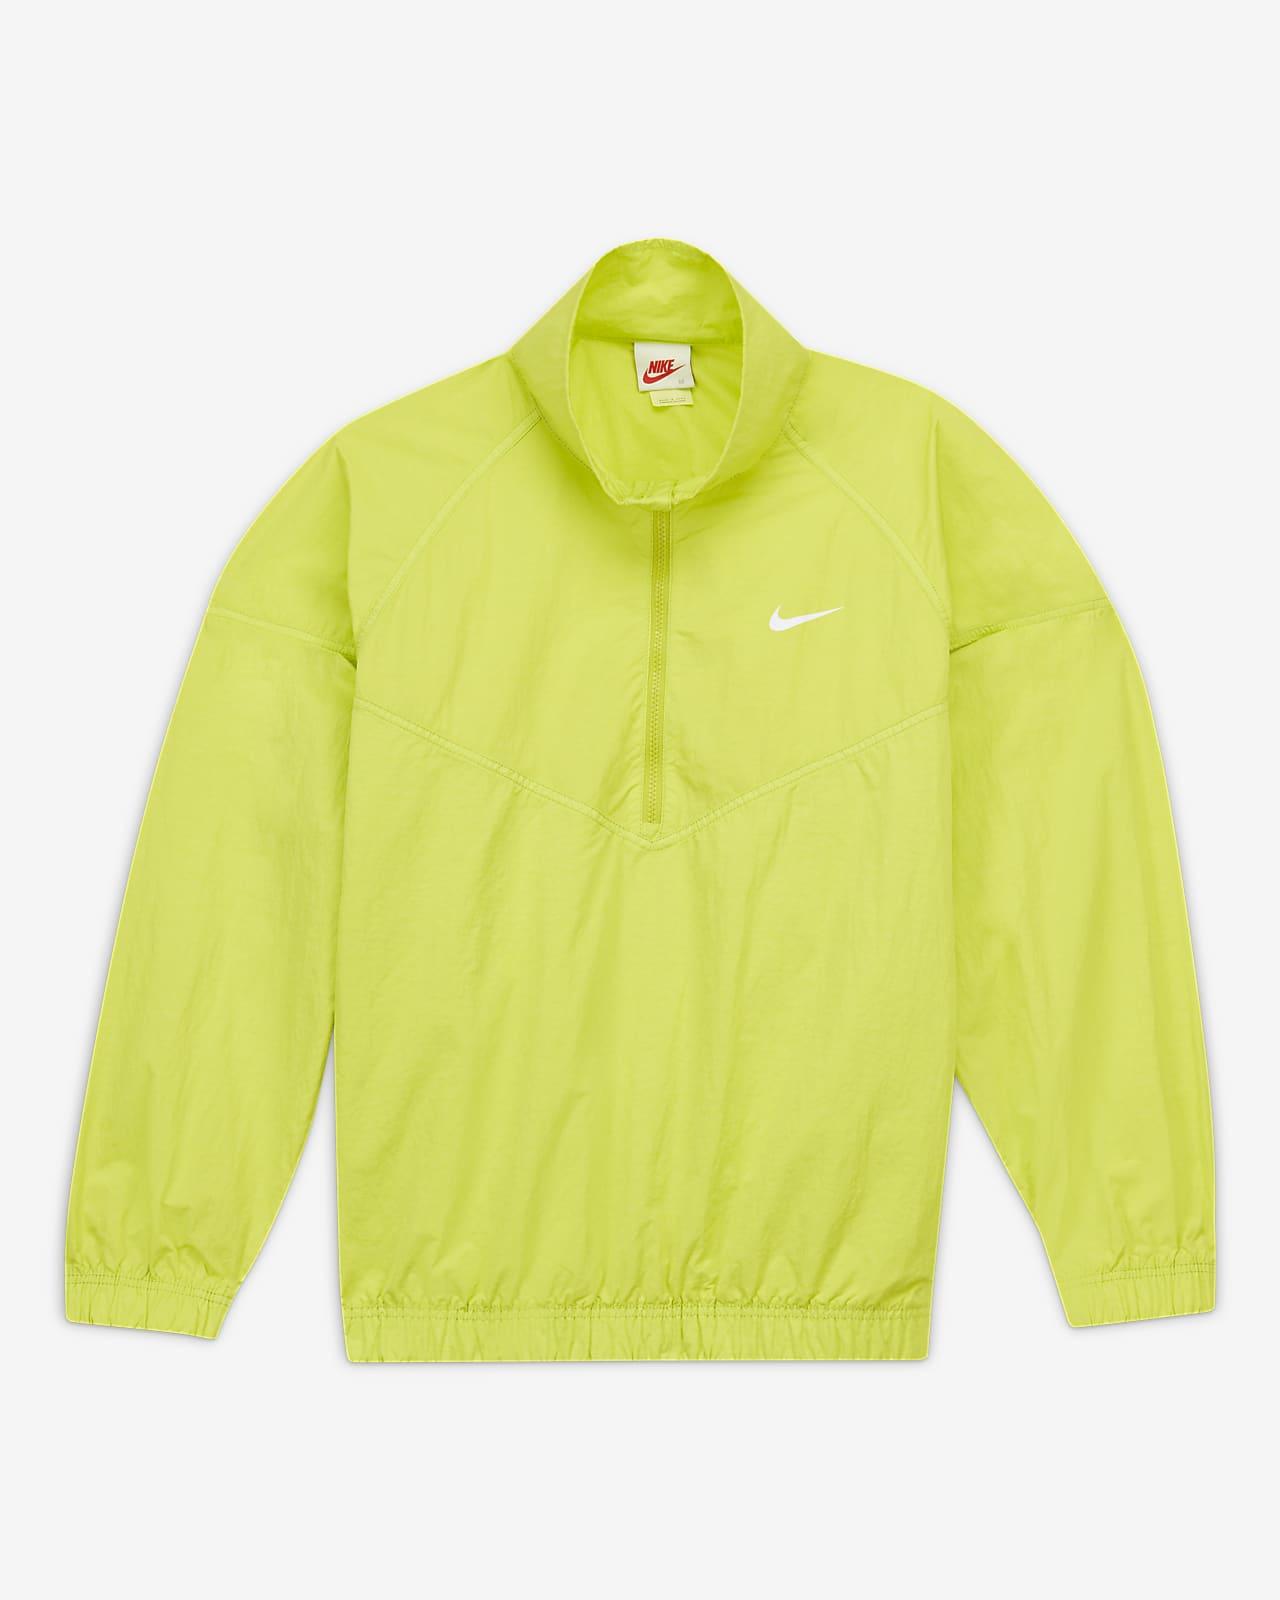 Bunda Nike x Stüssy Windrunner